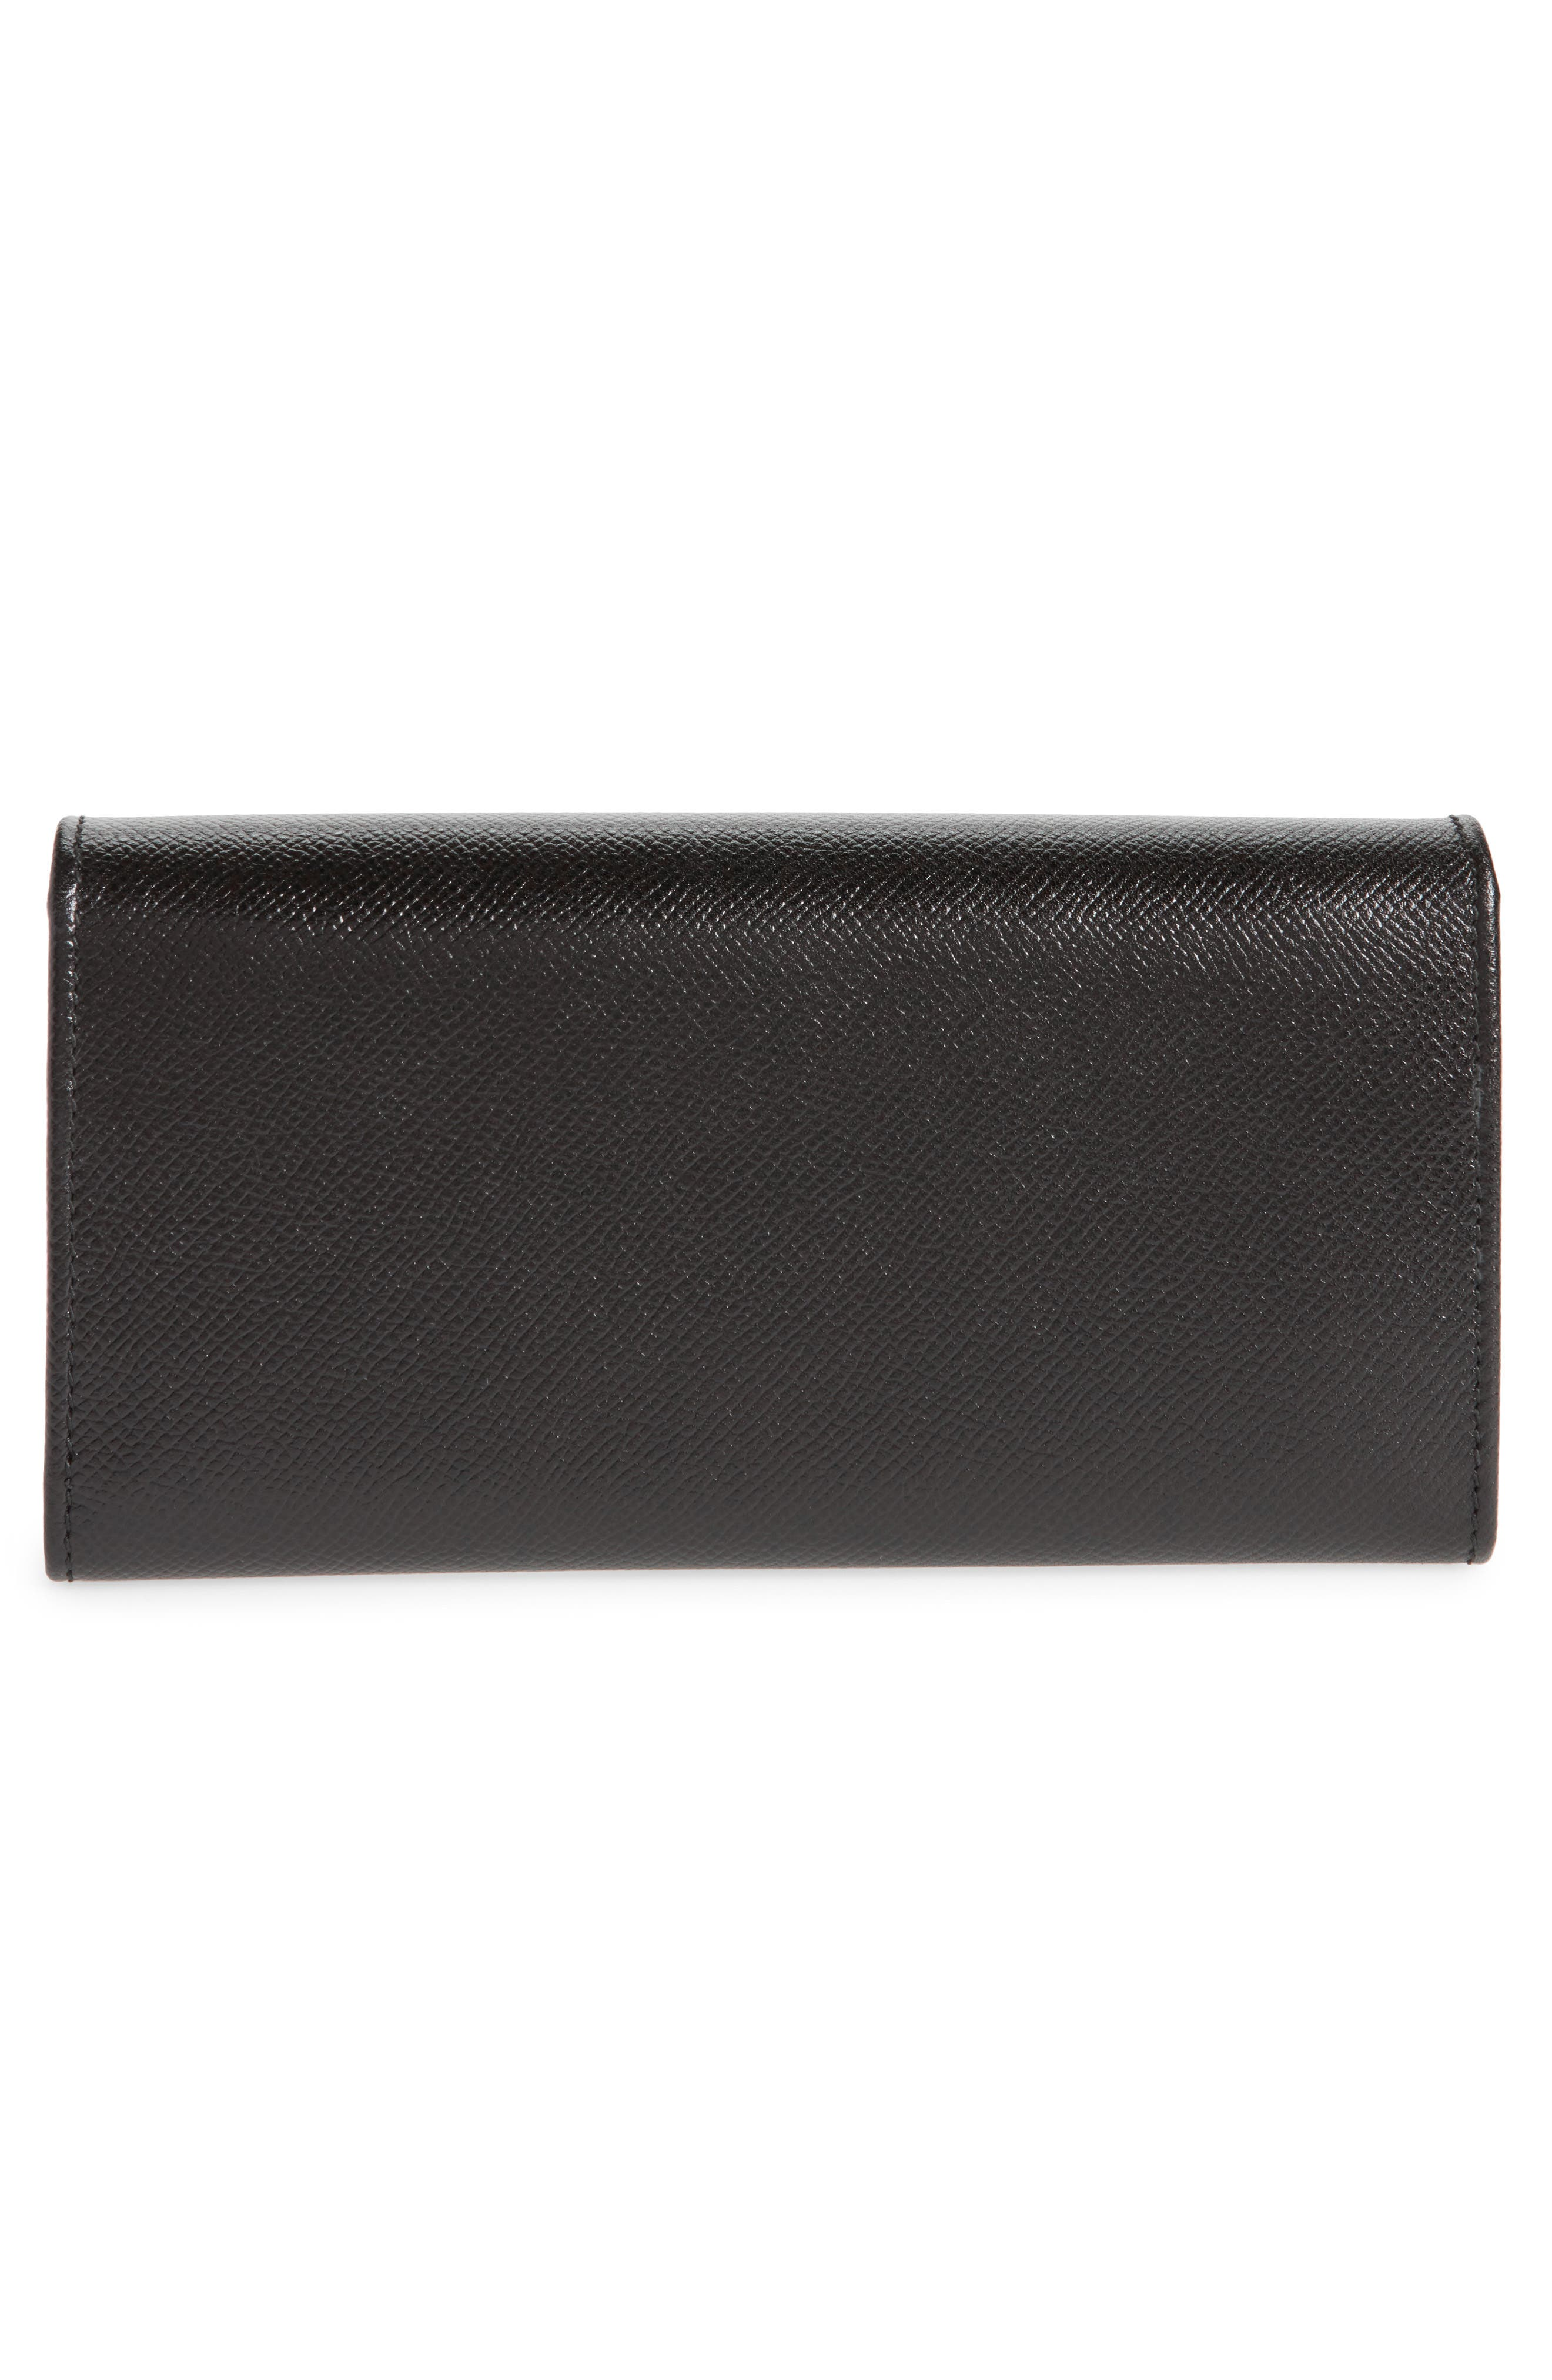 Gancio Leather Continental Wallet,                             Alternate thumbnail 4, color,                             Nero